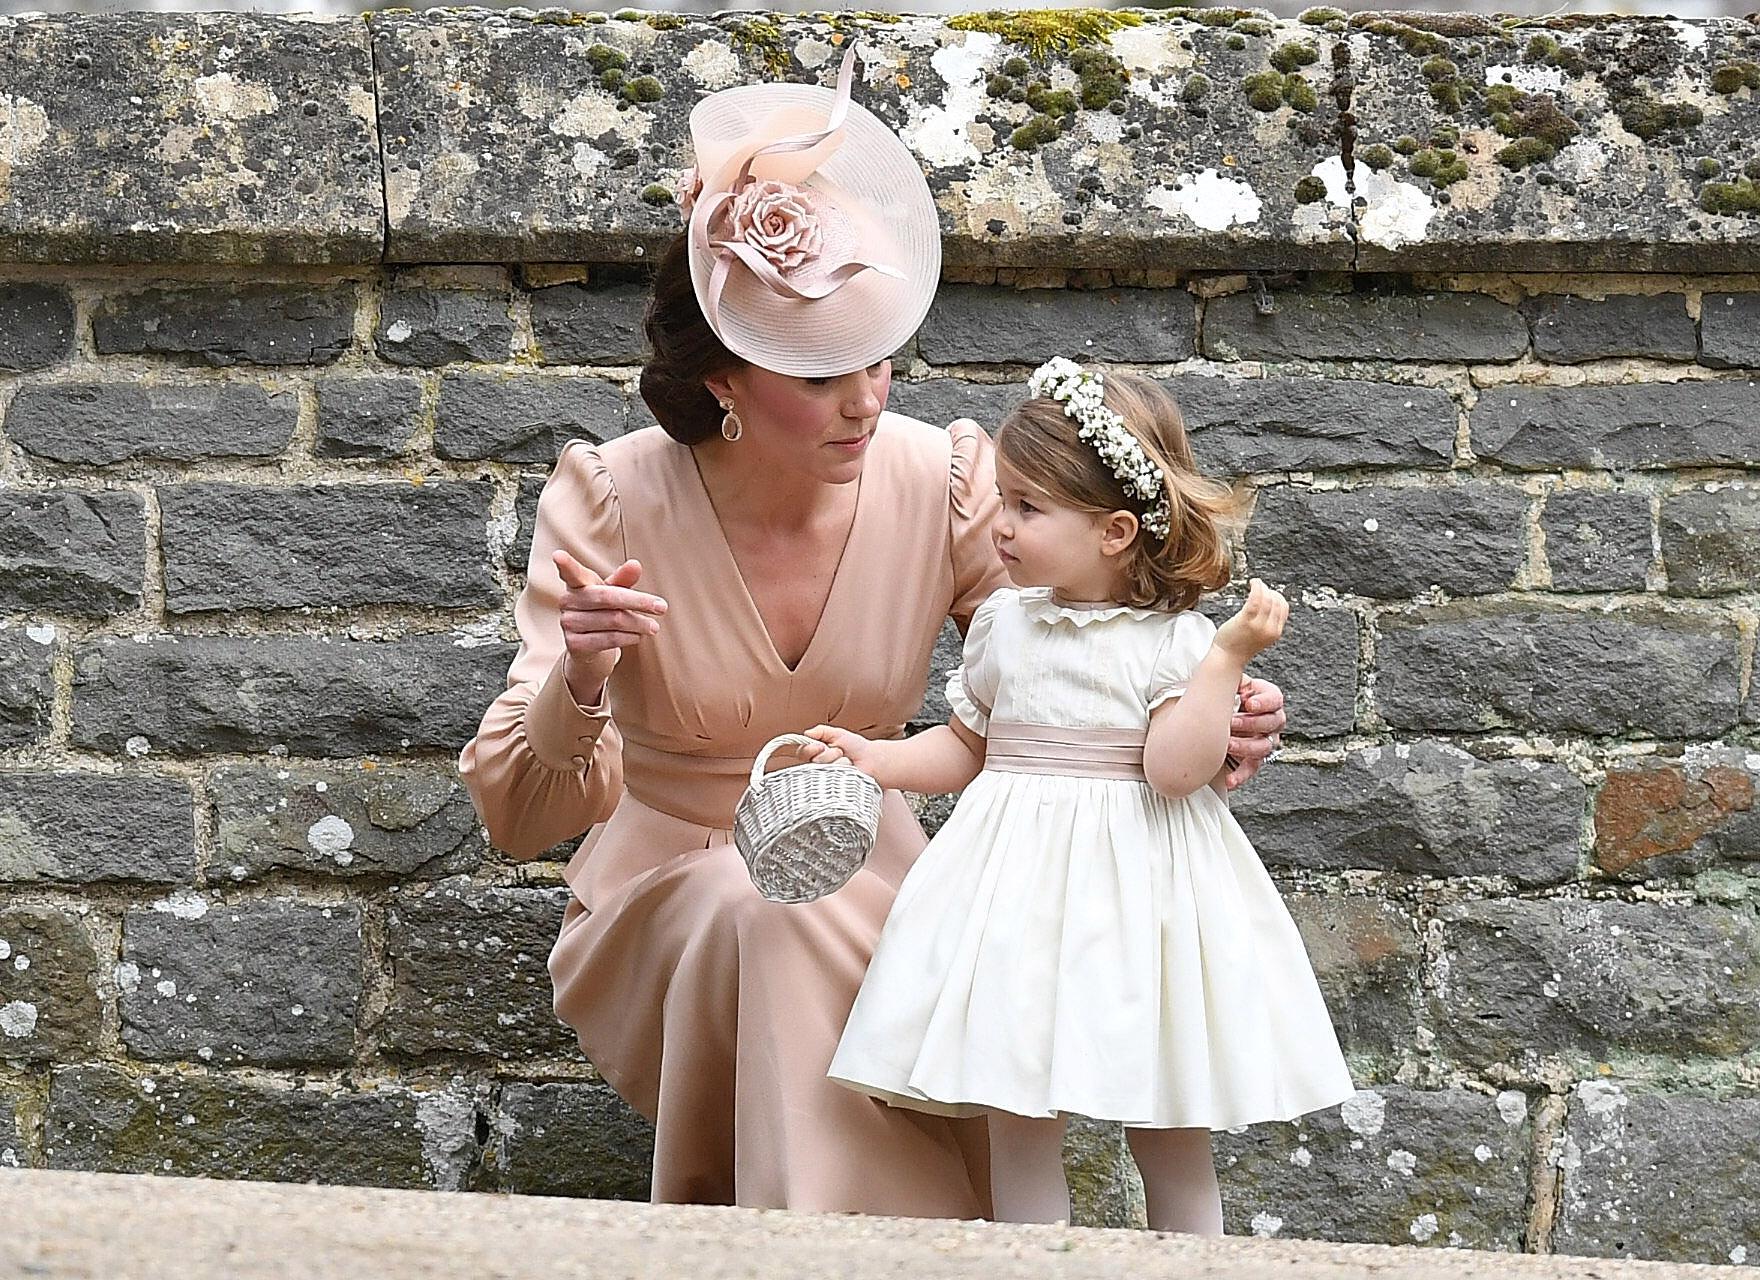 Princess Charlotte and Kate Middleton at Pippa Middleton's wedding